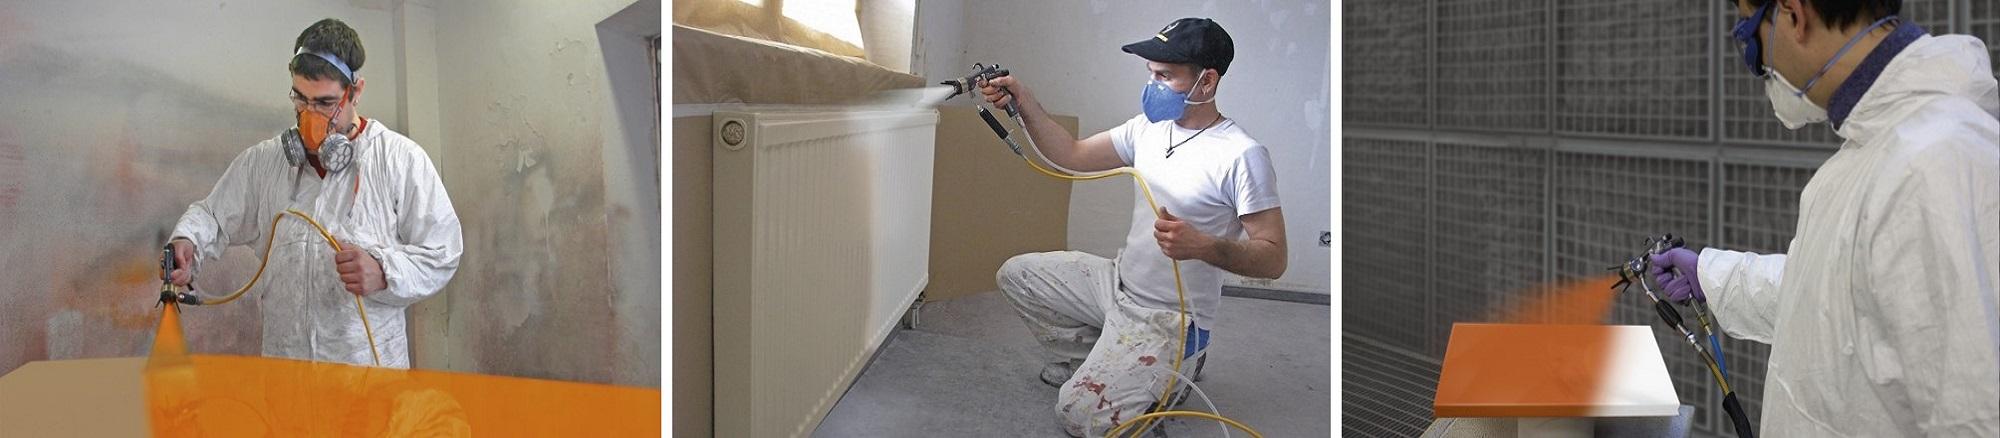 Yorkshire Spray Services Ltd – Wagner Cobra 40:10 Action